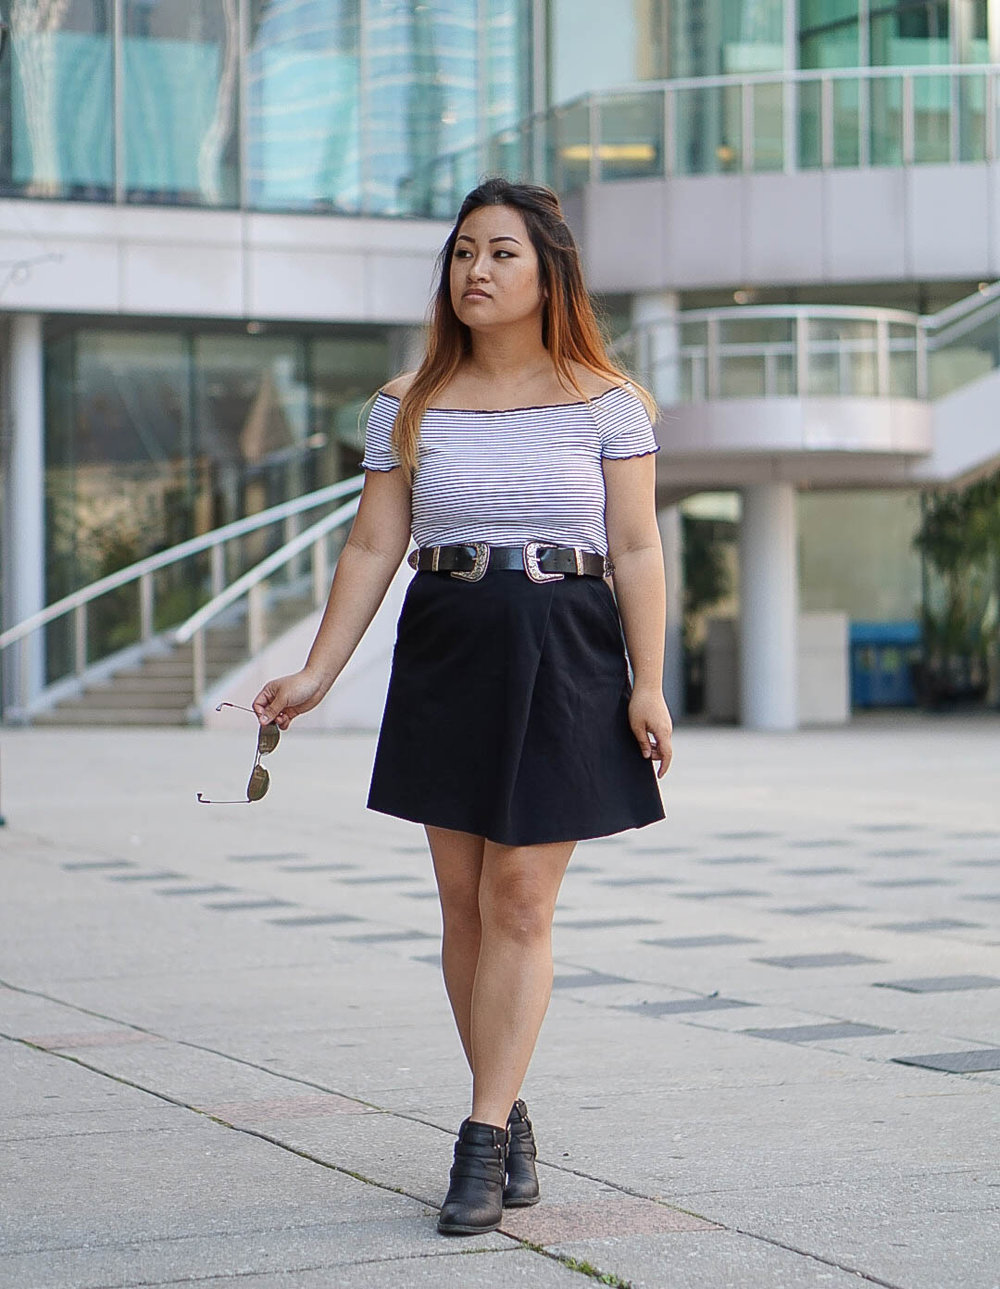 blogger ootd wearing zara and aritizia